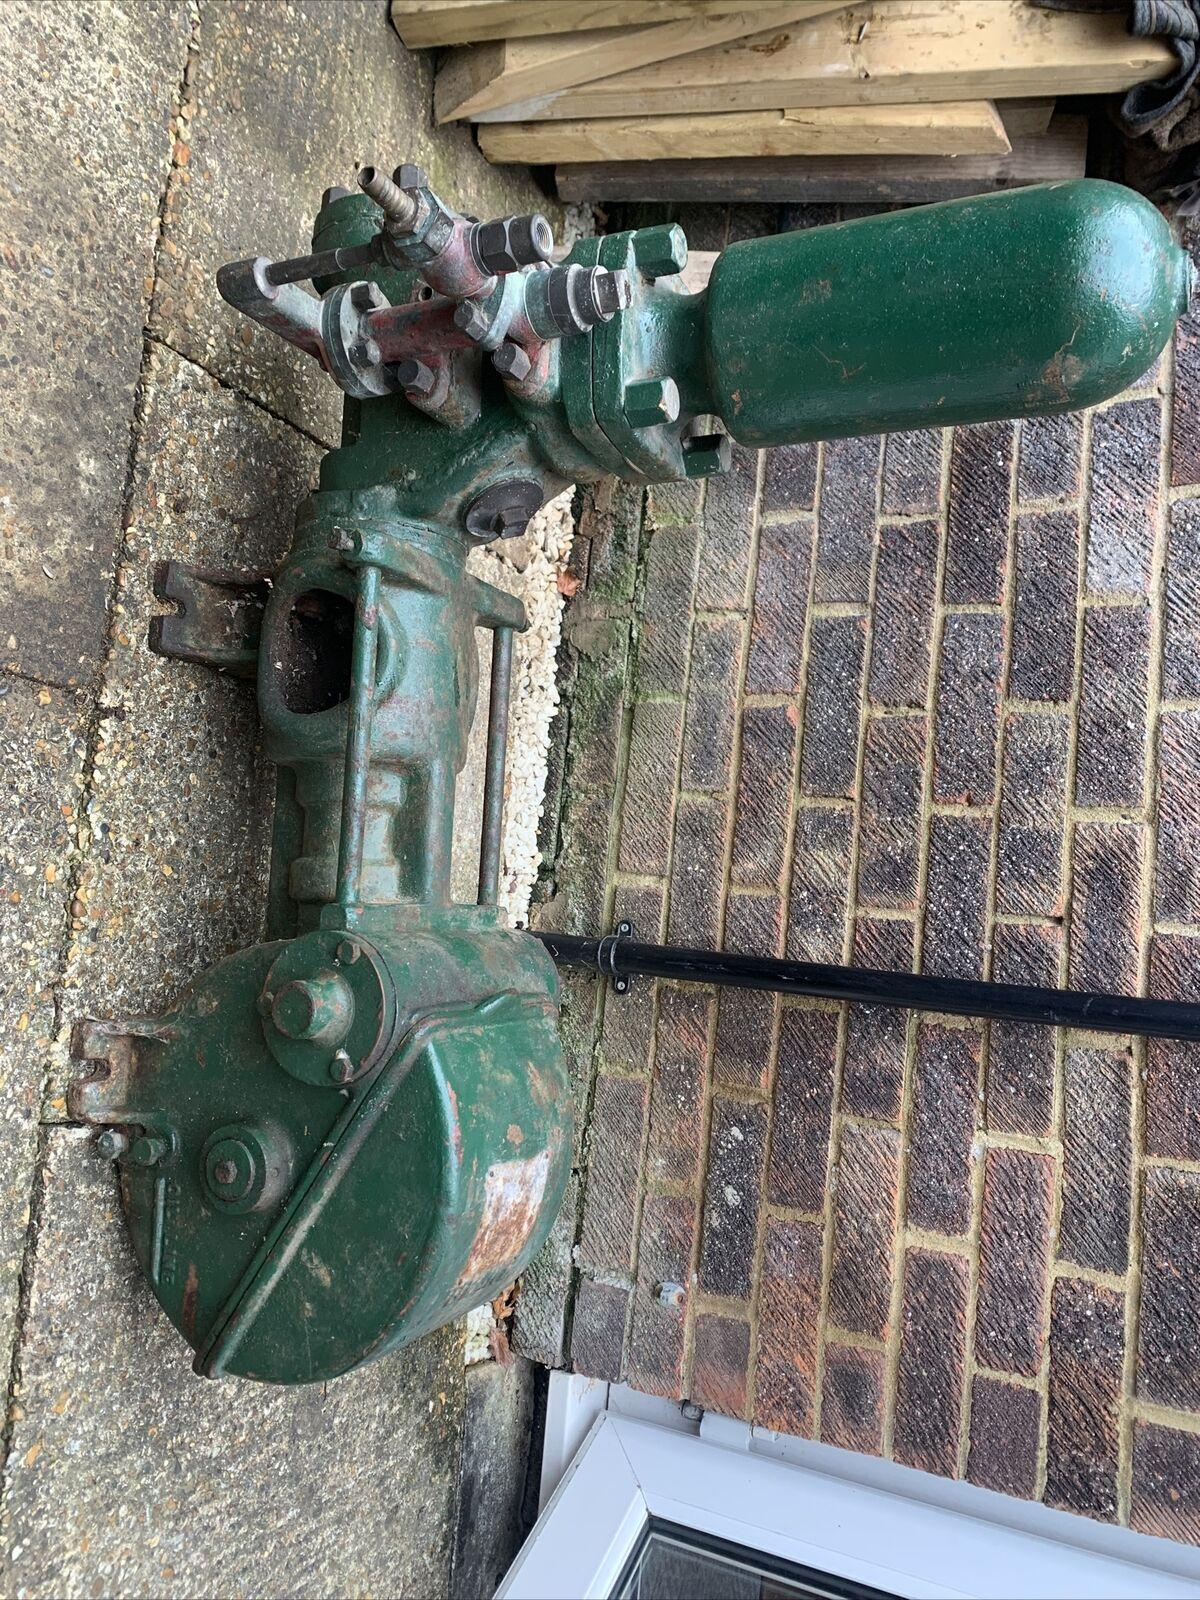 Blake Water Pump Stationary Engine